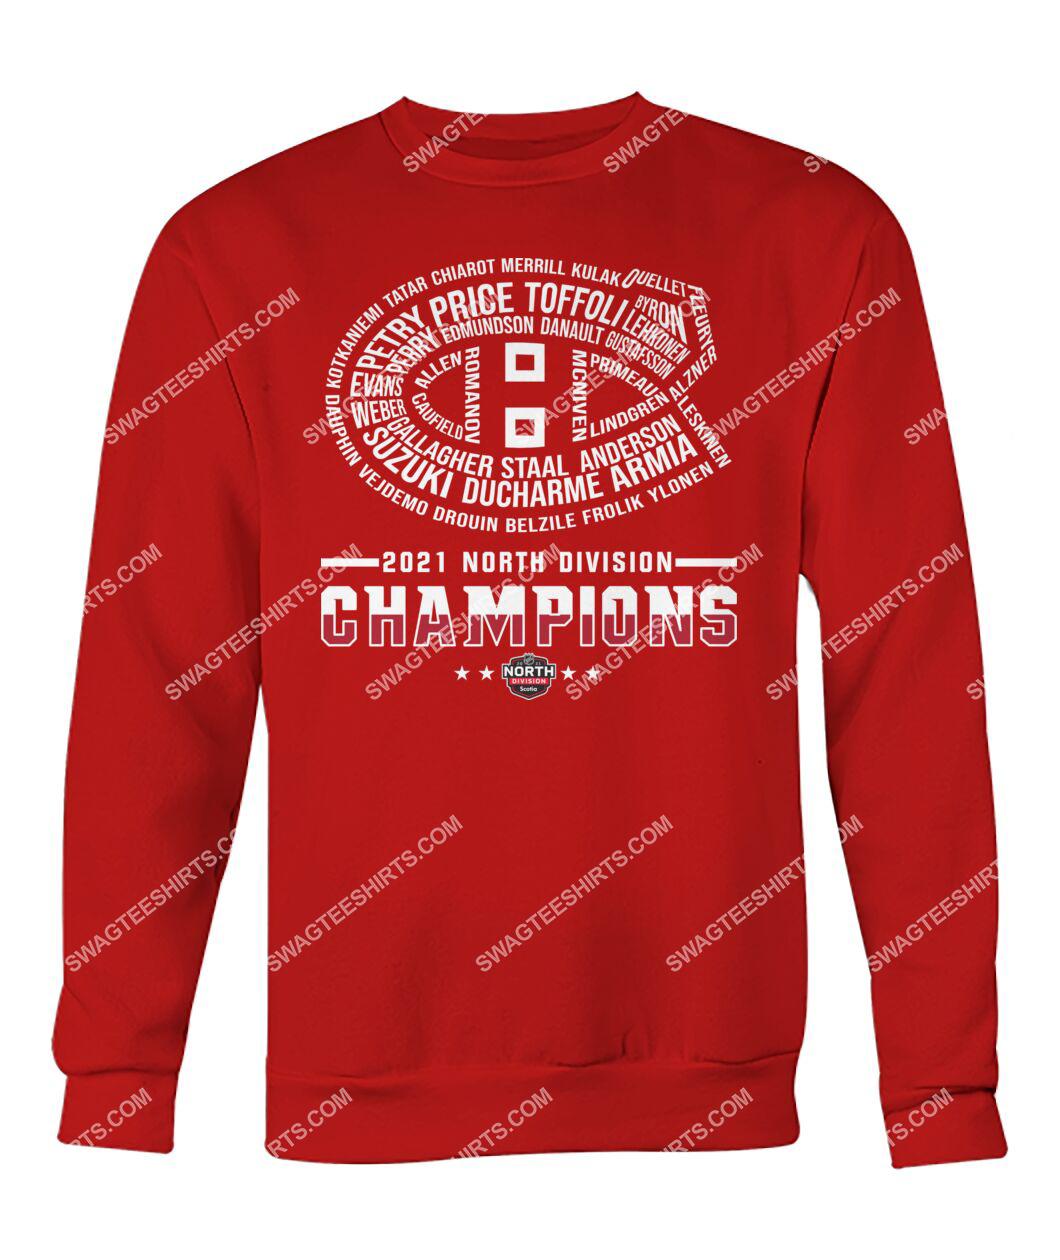 montreal canadiens 2021 north division champions sweatshirt 1